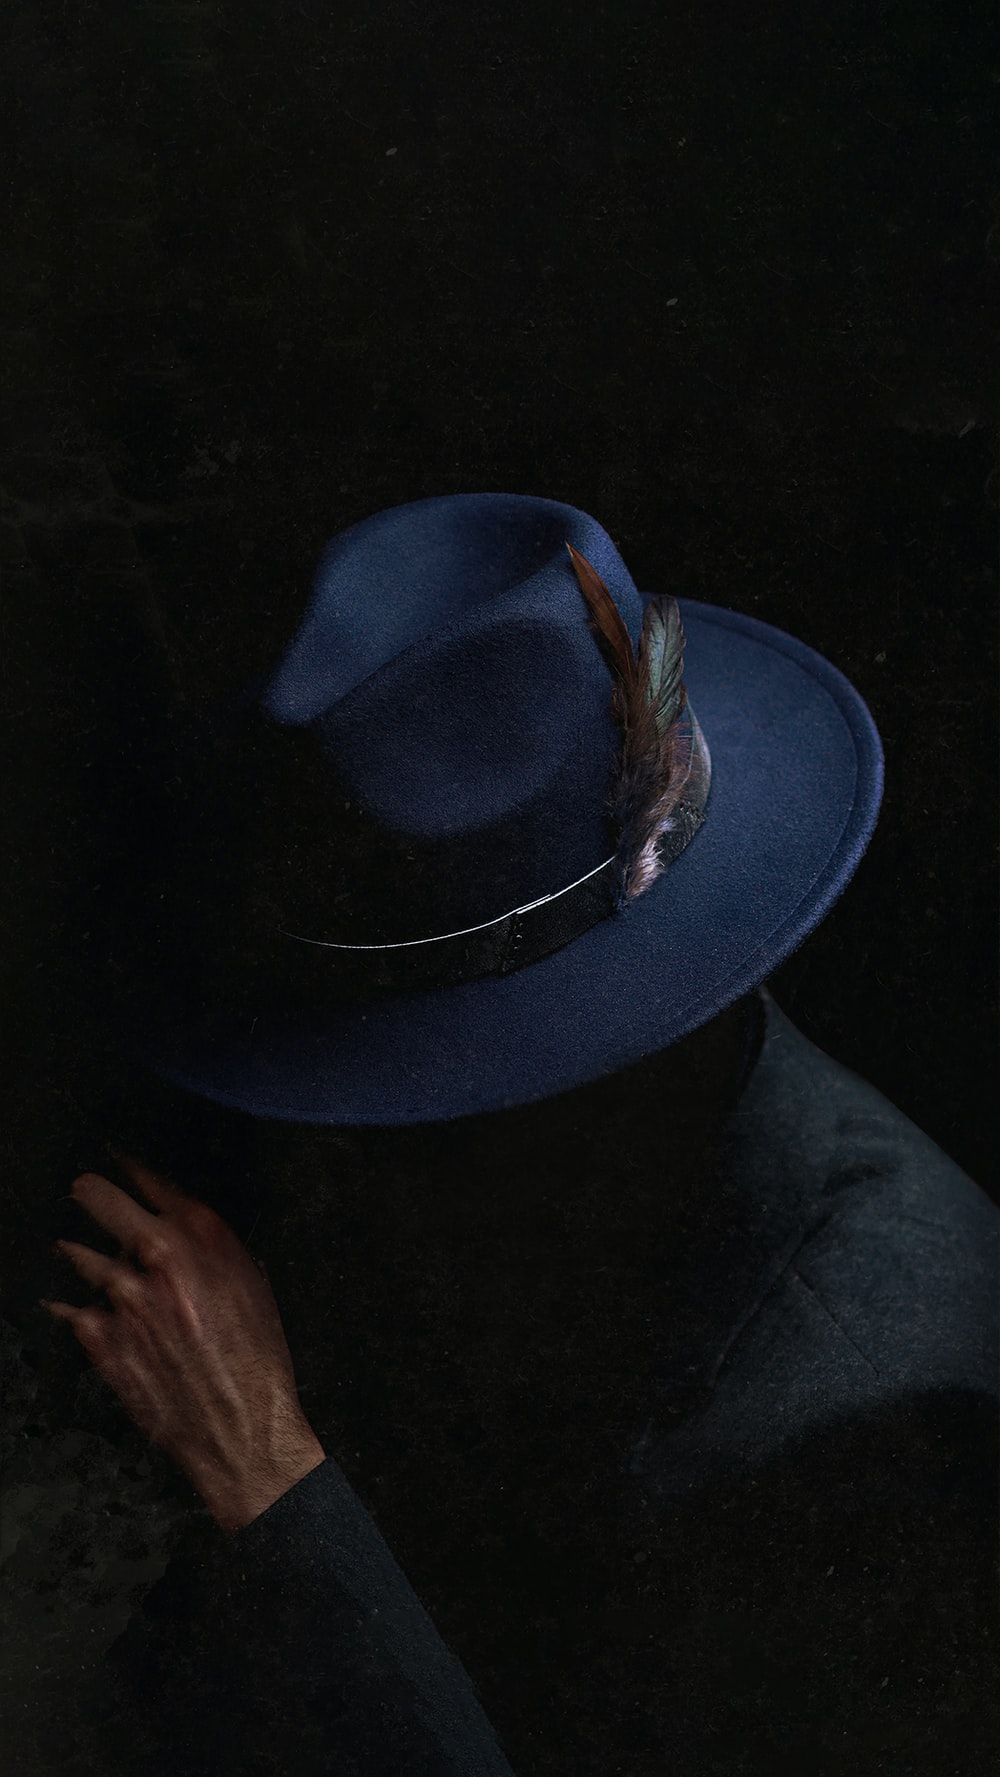 person holding black fedora hat